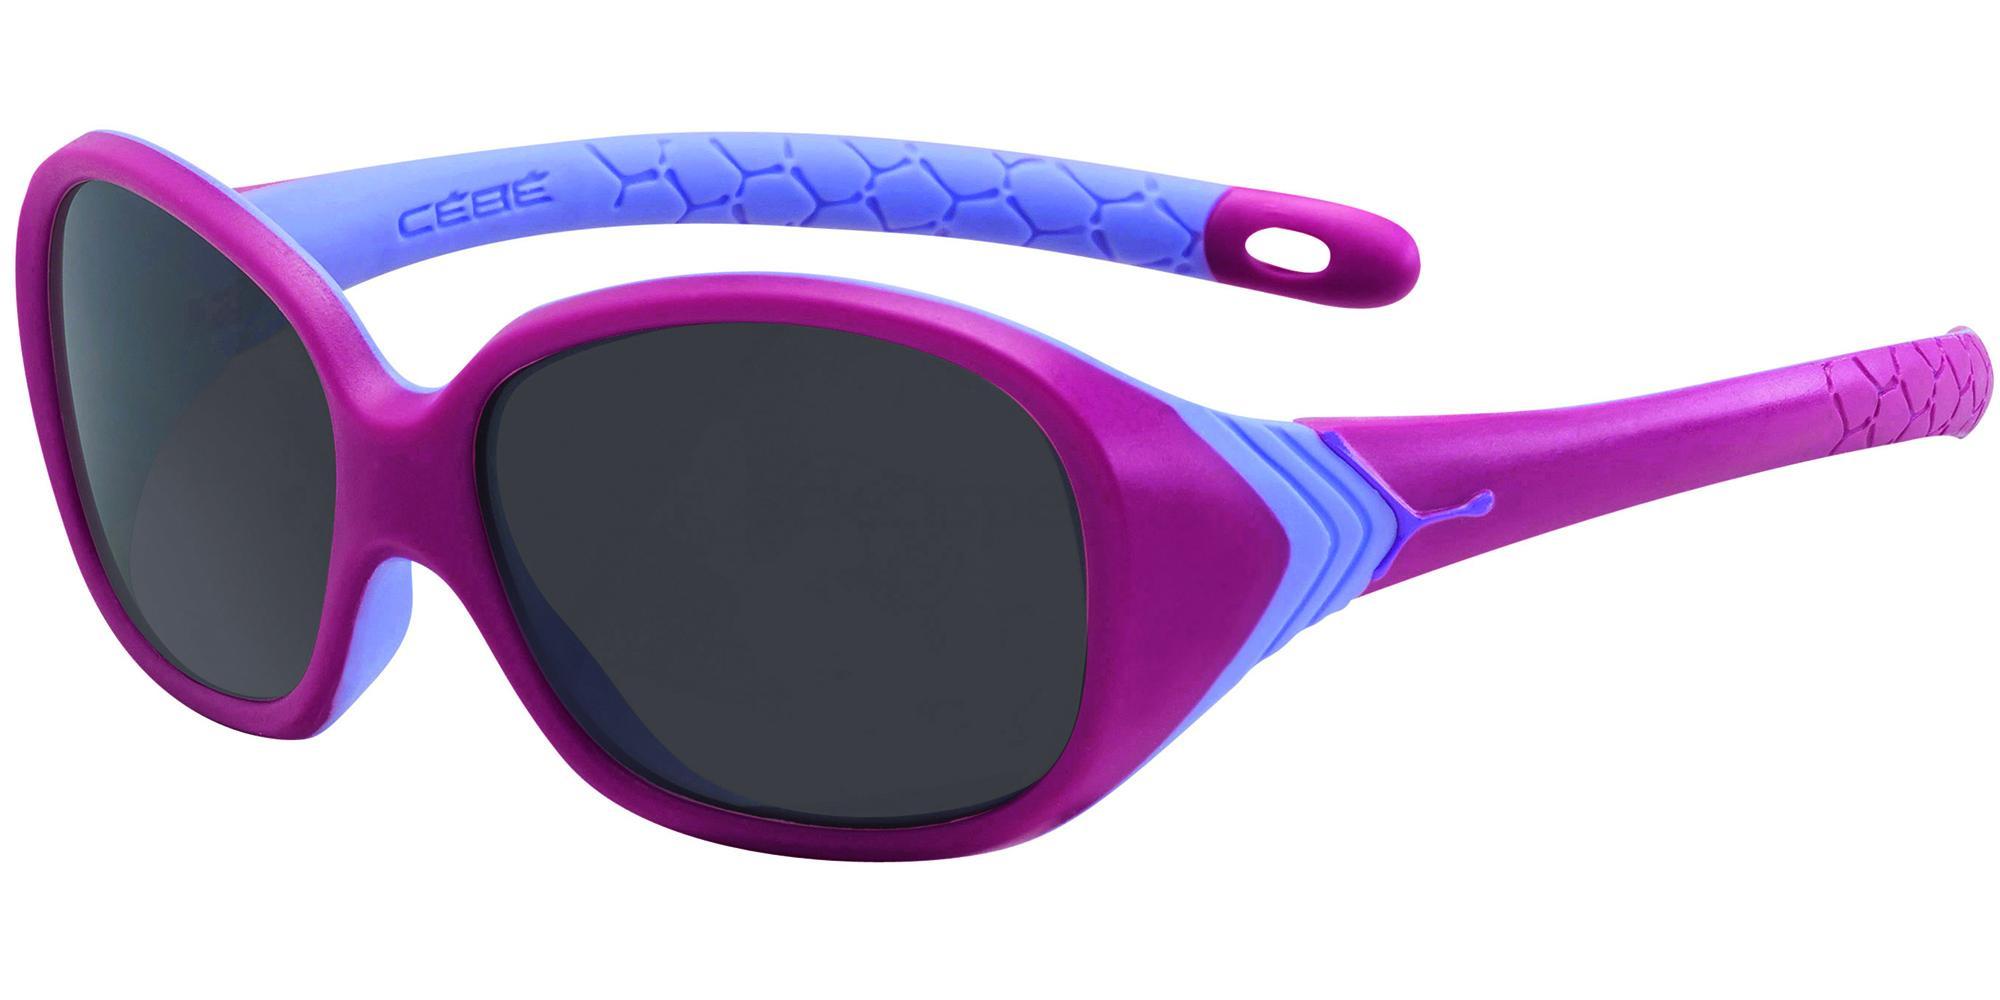 CBBALOO9 Baloo (Age 1-3) Sunglasses, Cebe JUNIOR